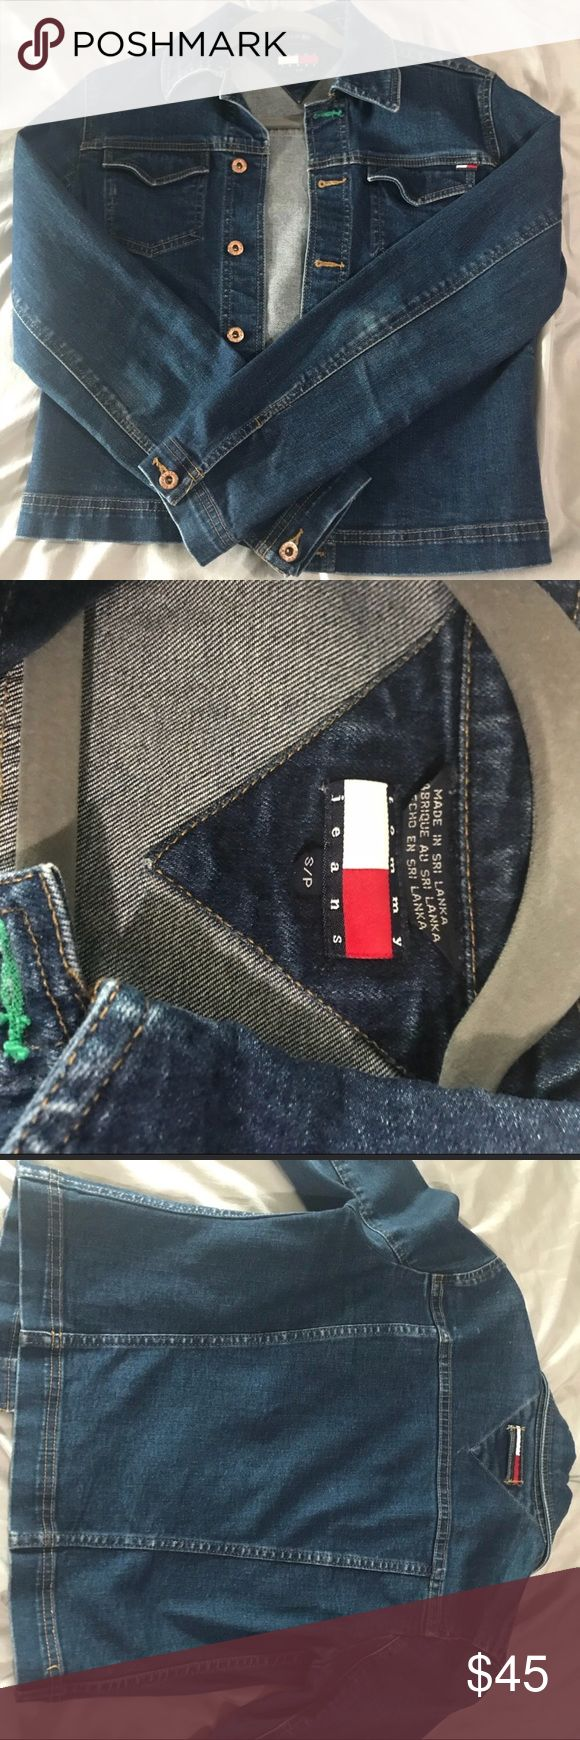 Tommy Hilfiger Jean Jacket Original Tommy Hilfiger jean